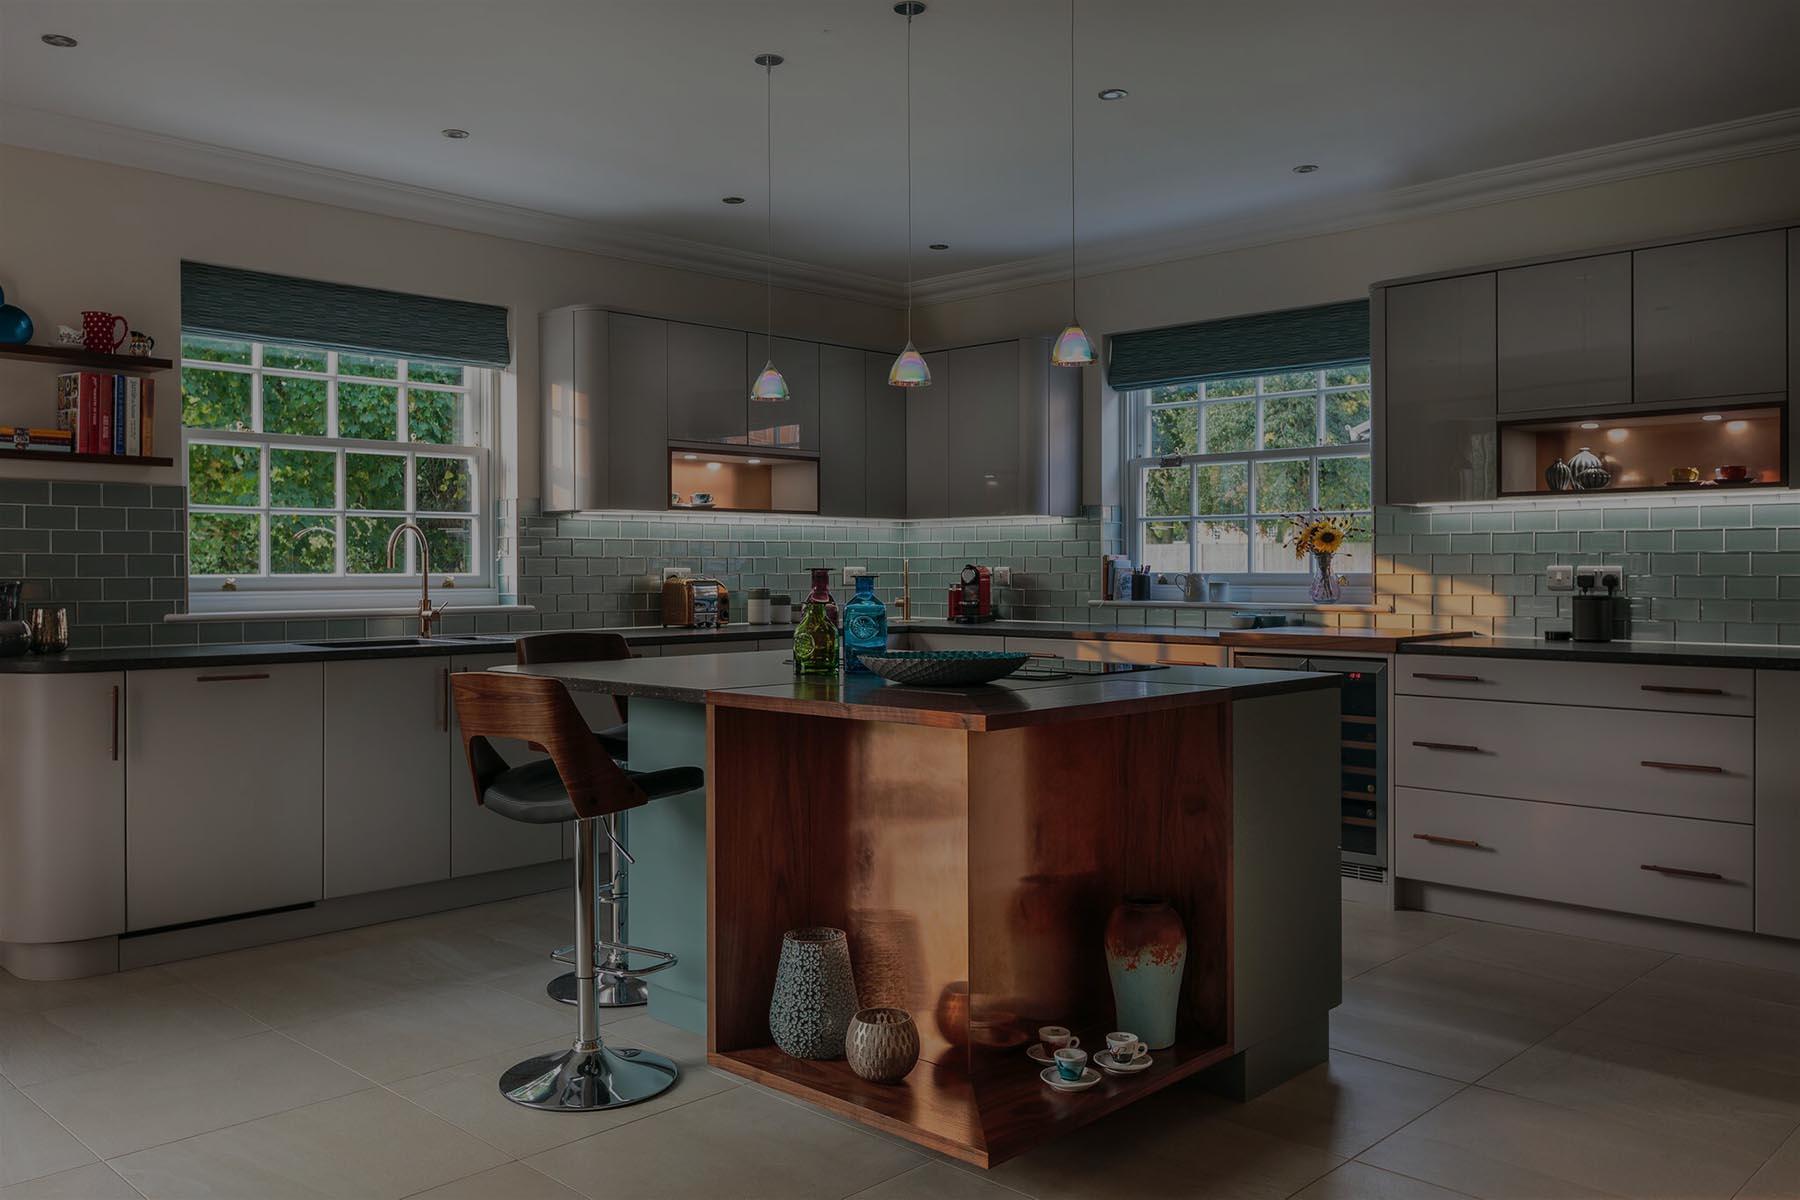 furniture for kitchen range hood kestrel kitchens bespoke norfolk handmade norwich h